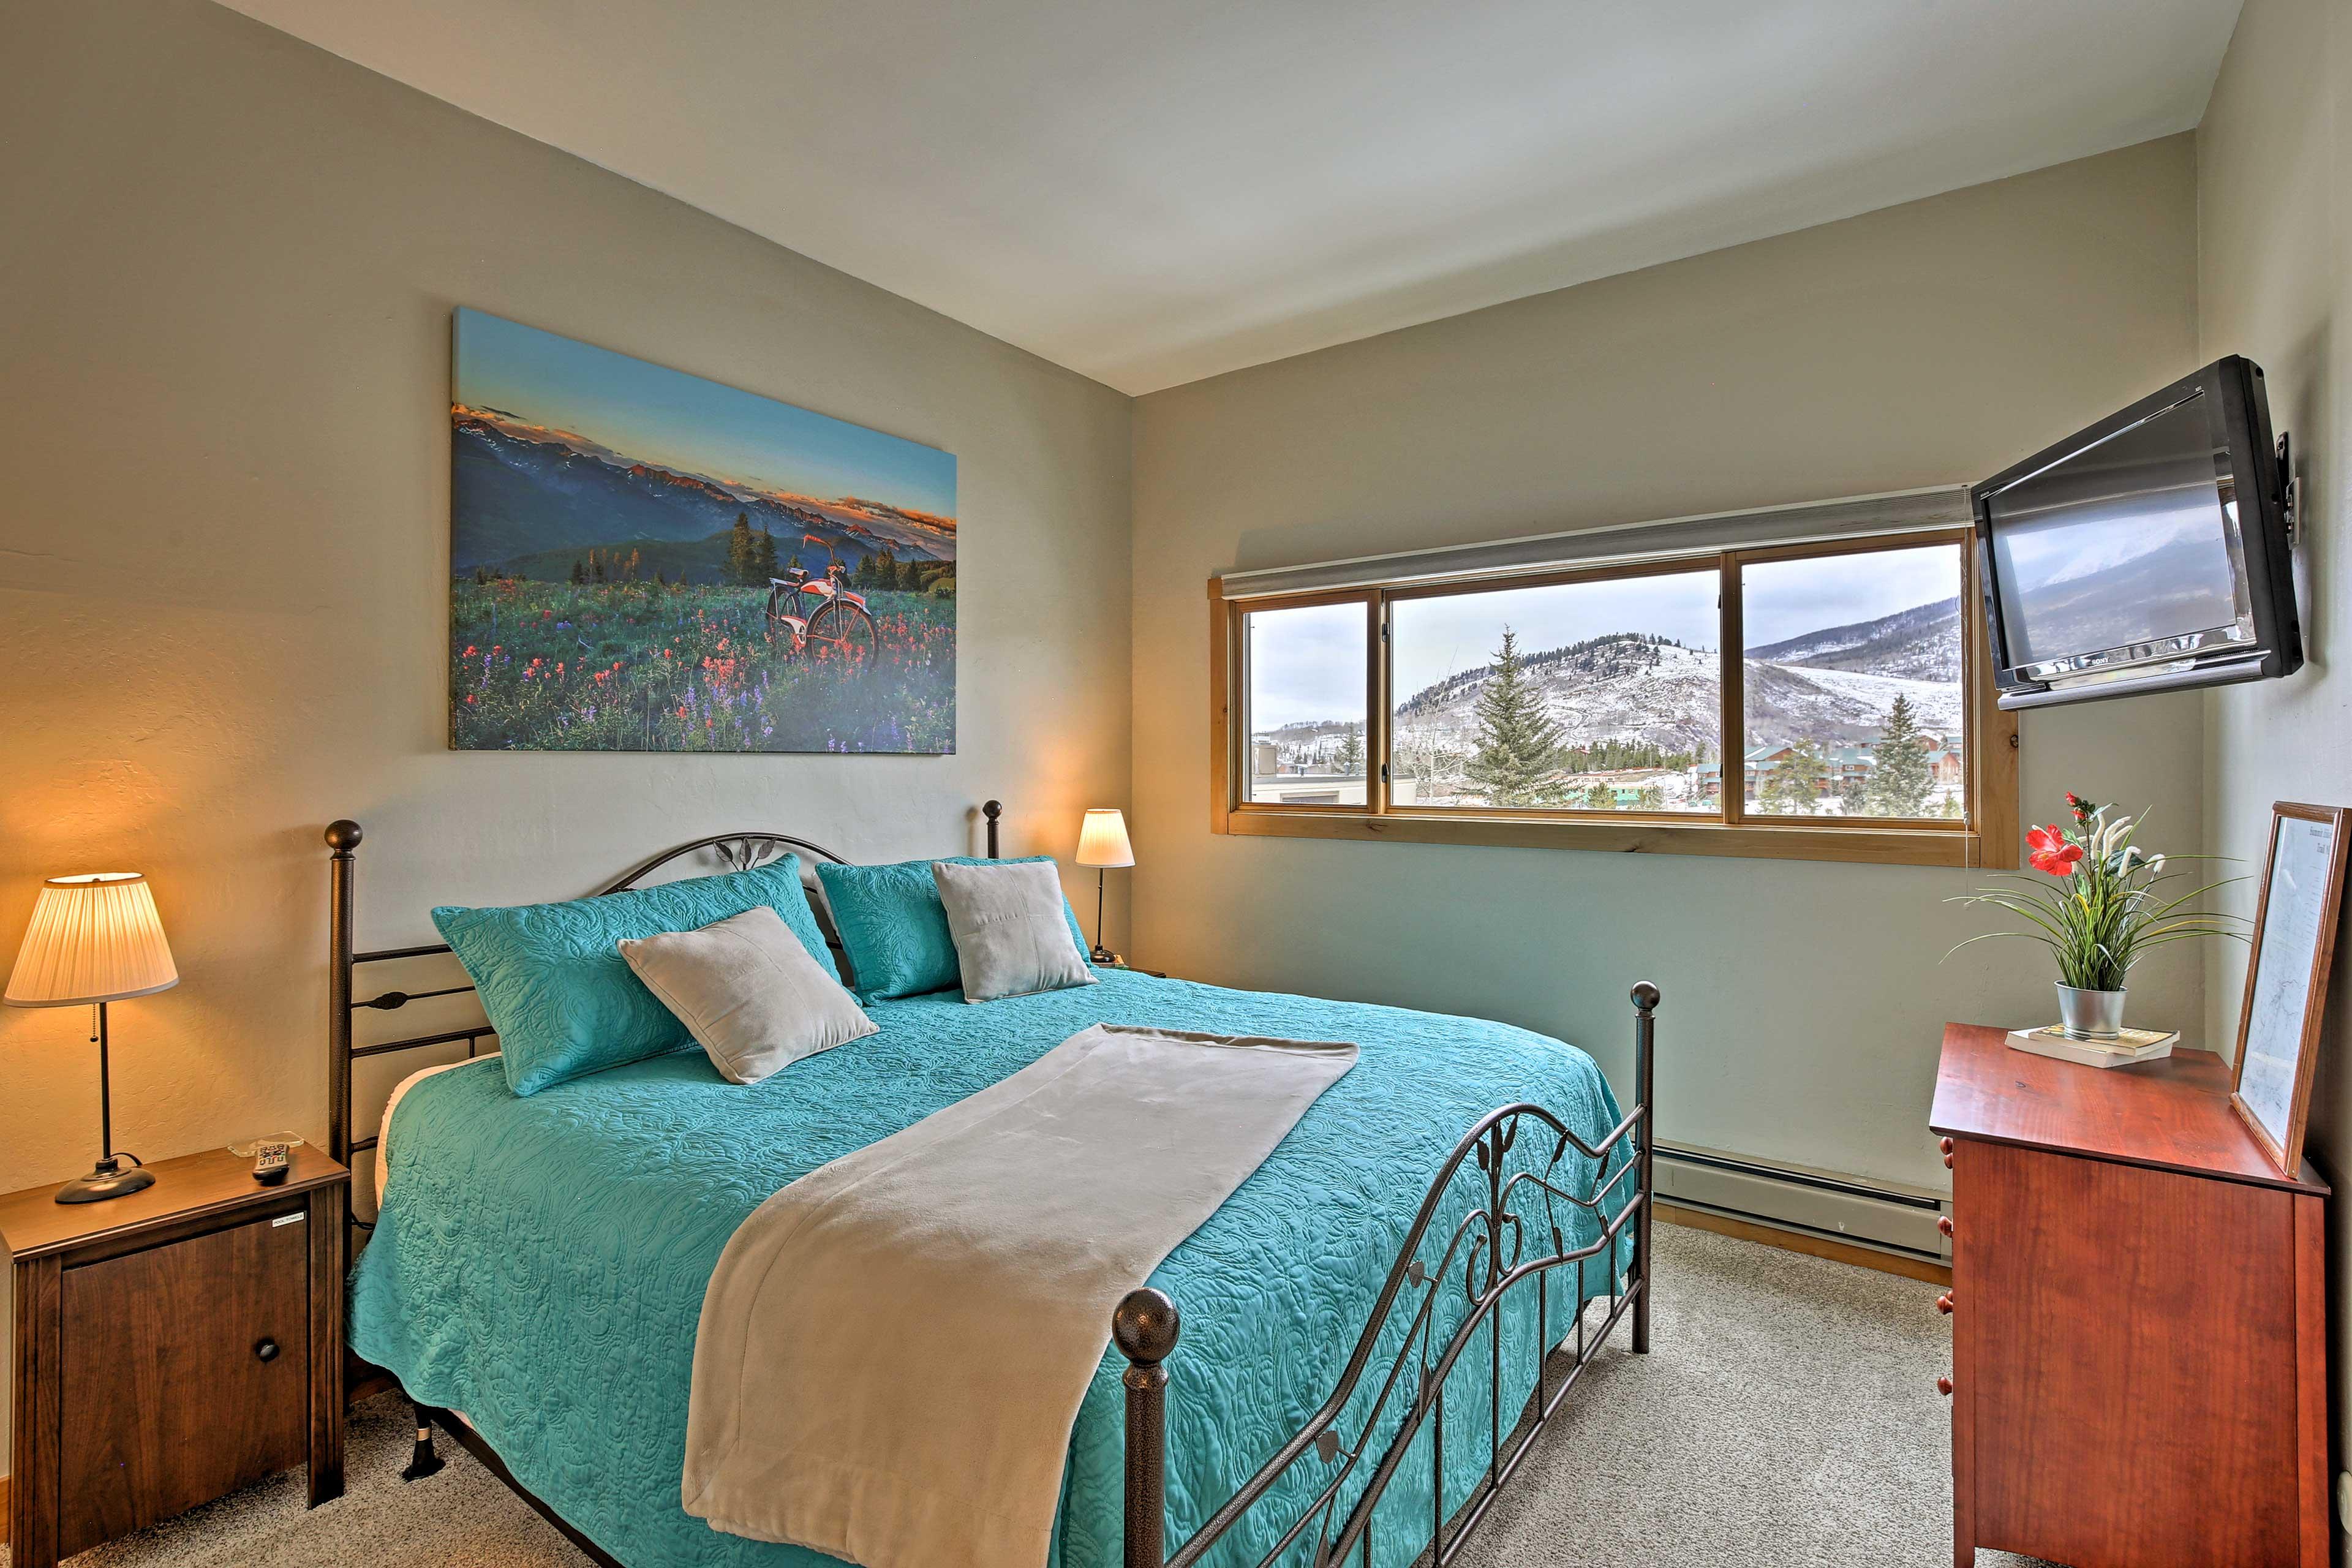 Master Bedroom | King Euro-Top Bed